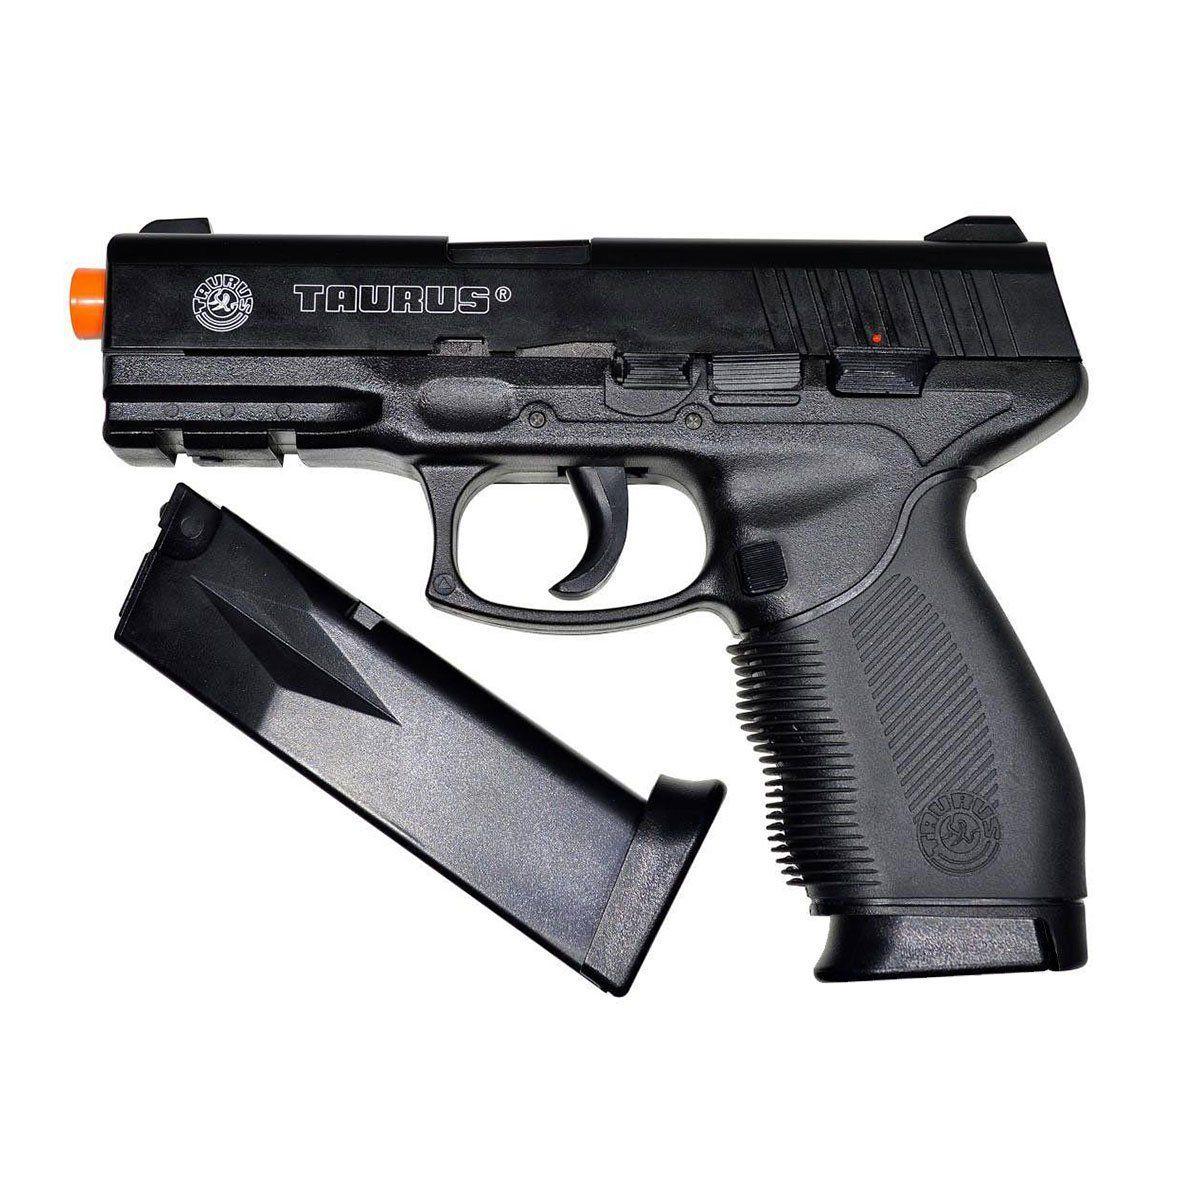 Pistola Airsoft Cybergun Taurus Spring Black 24/7 Spring 6mm